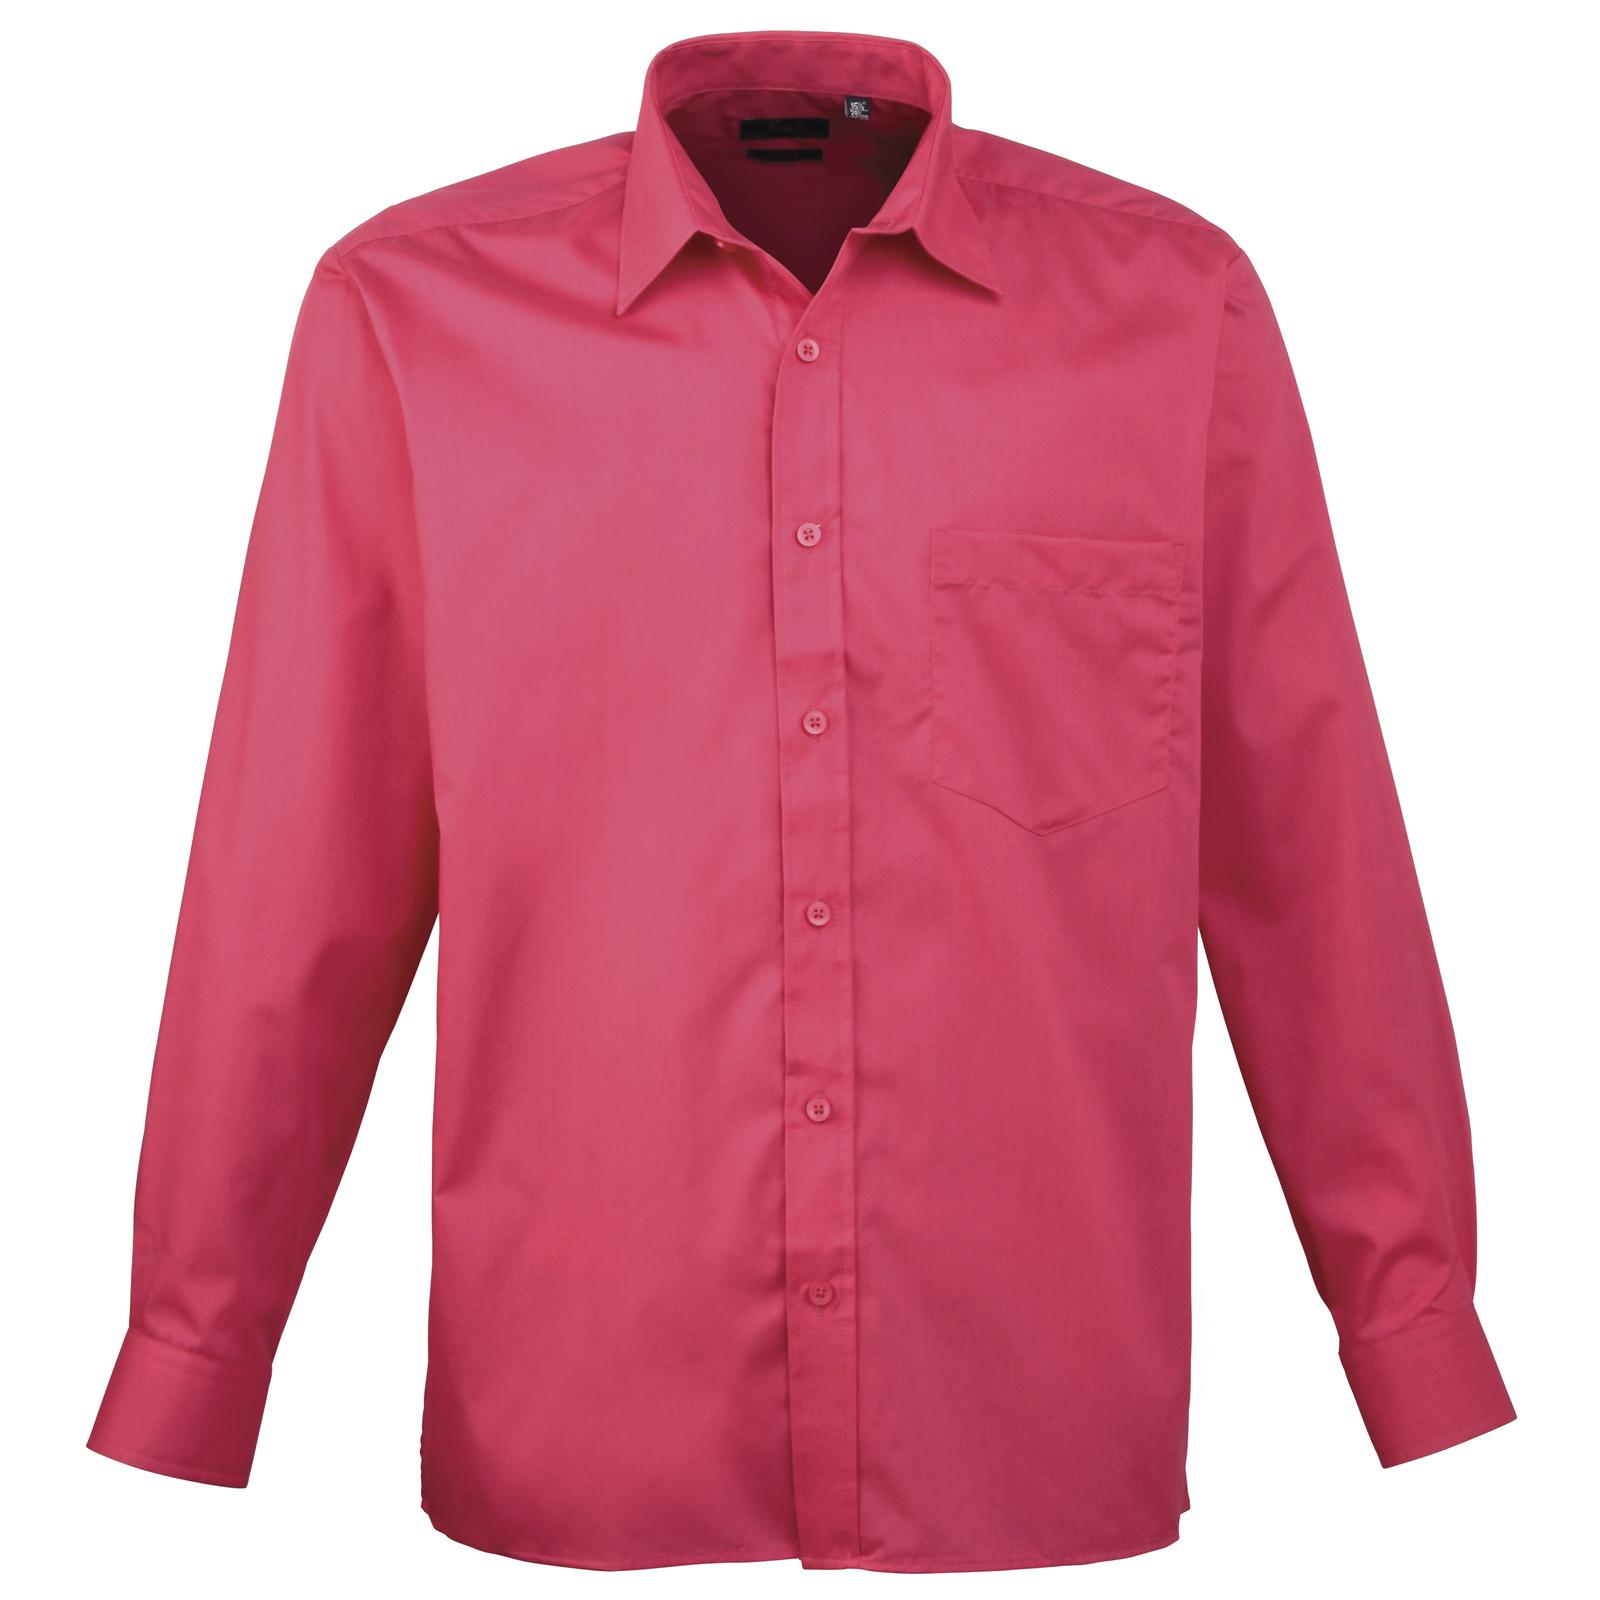 New premier mens business work smart long sleeve poplin for Business shirts for men